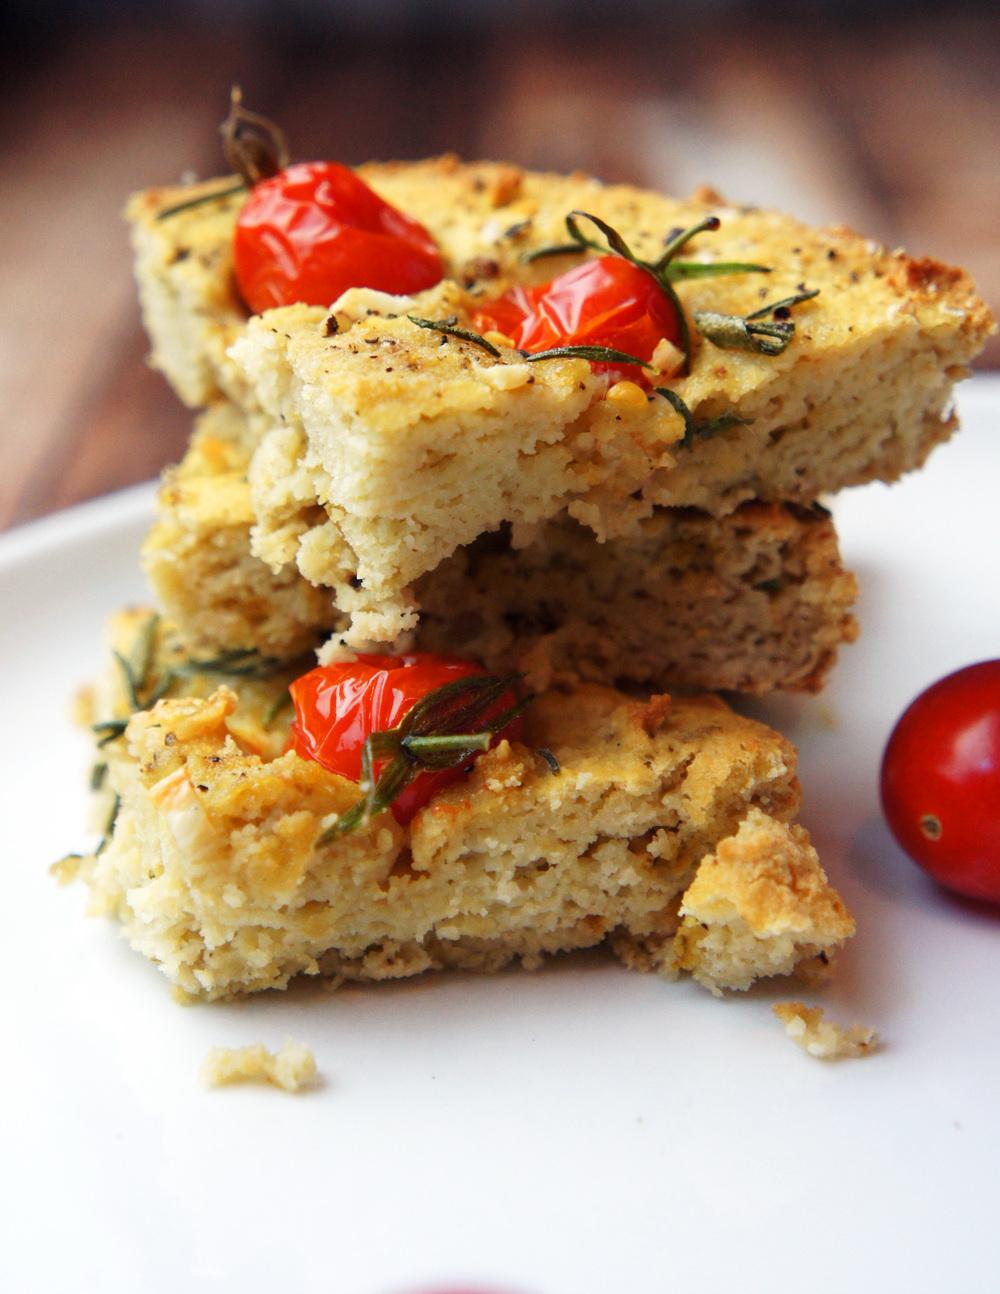 Paleo, grain-free Italian Focaccia Bread with mini cherry tomatoes, rosemary, and sea salt